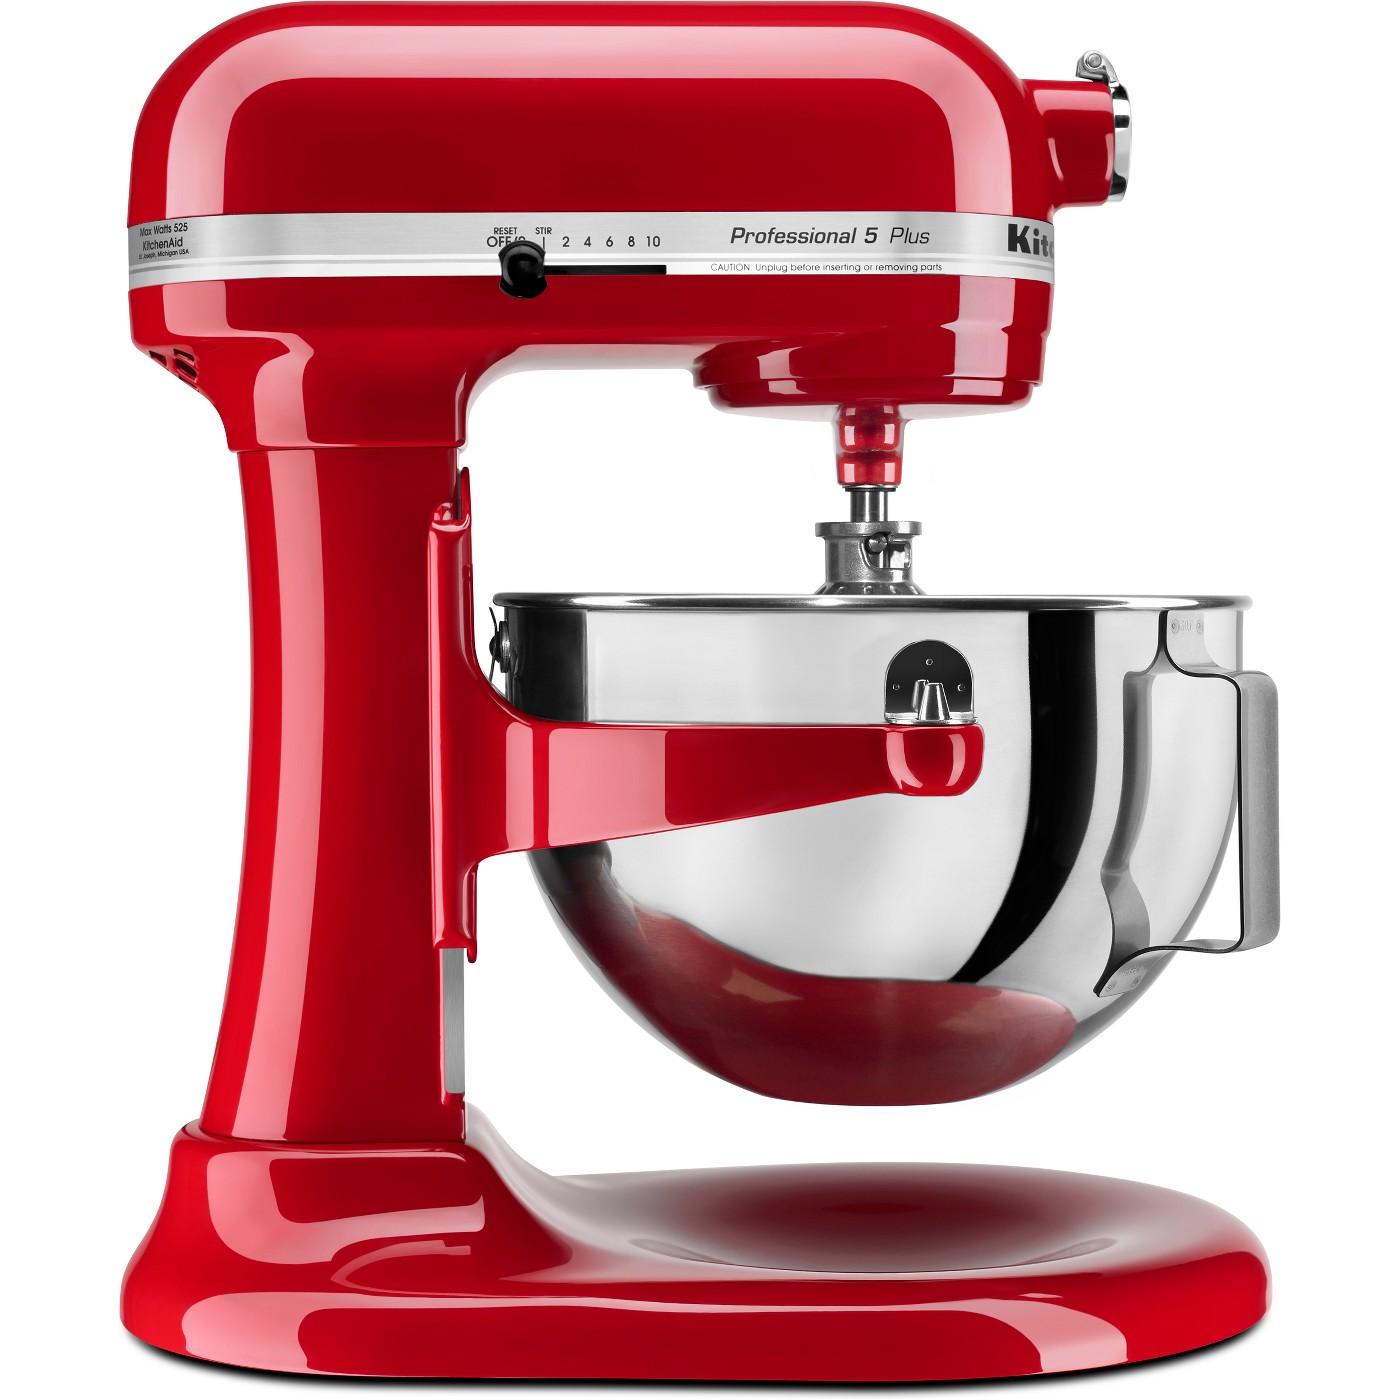 KitchenAid Professional 5 Qt Mixer - image 1 of 3